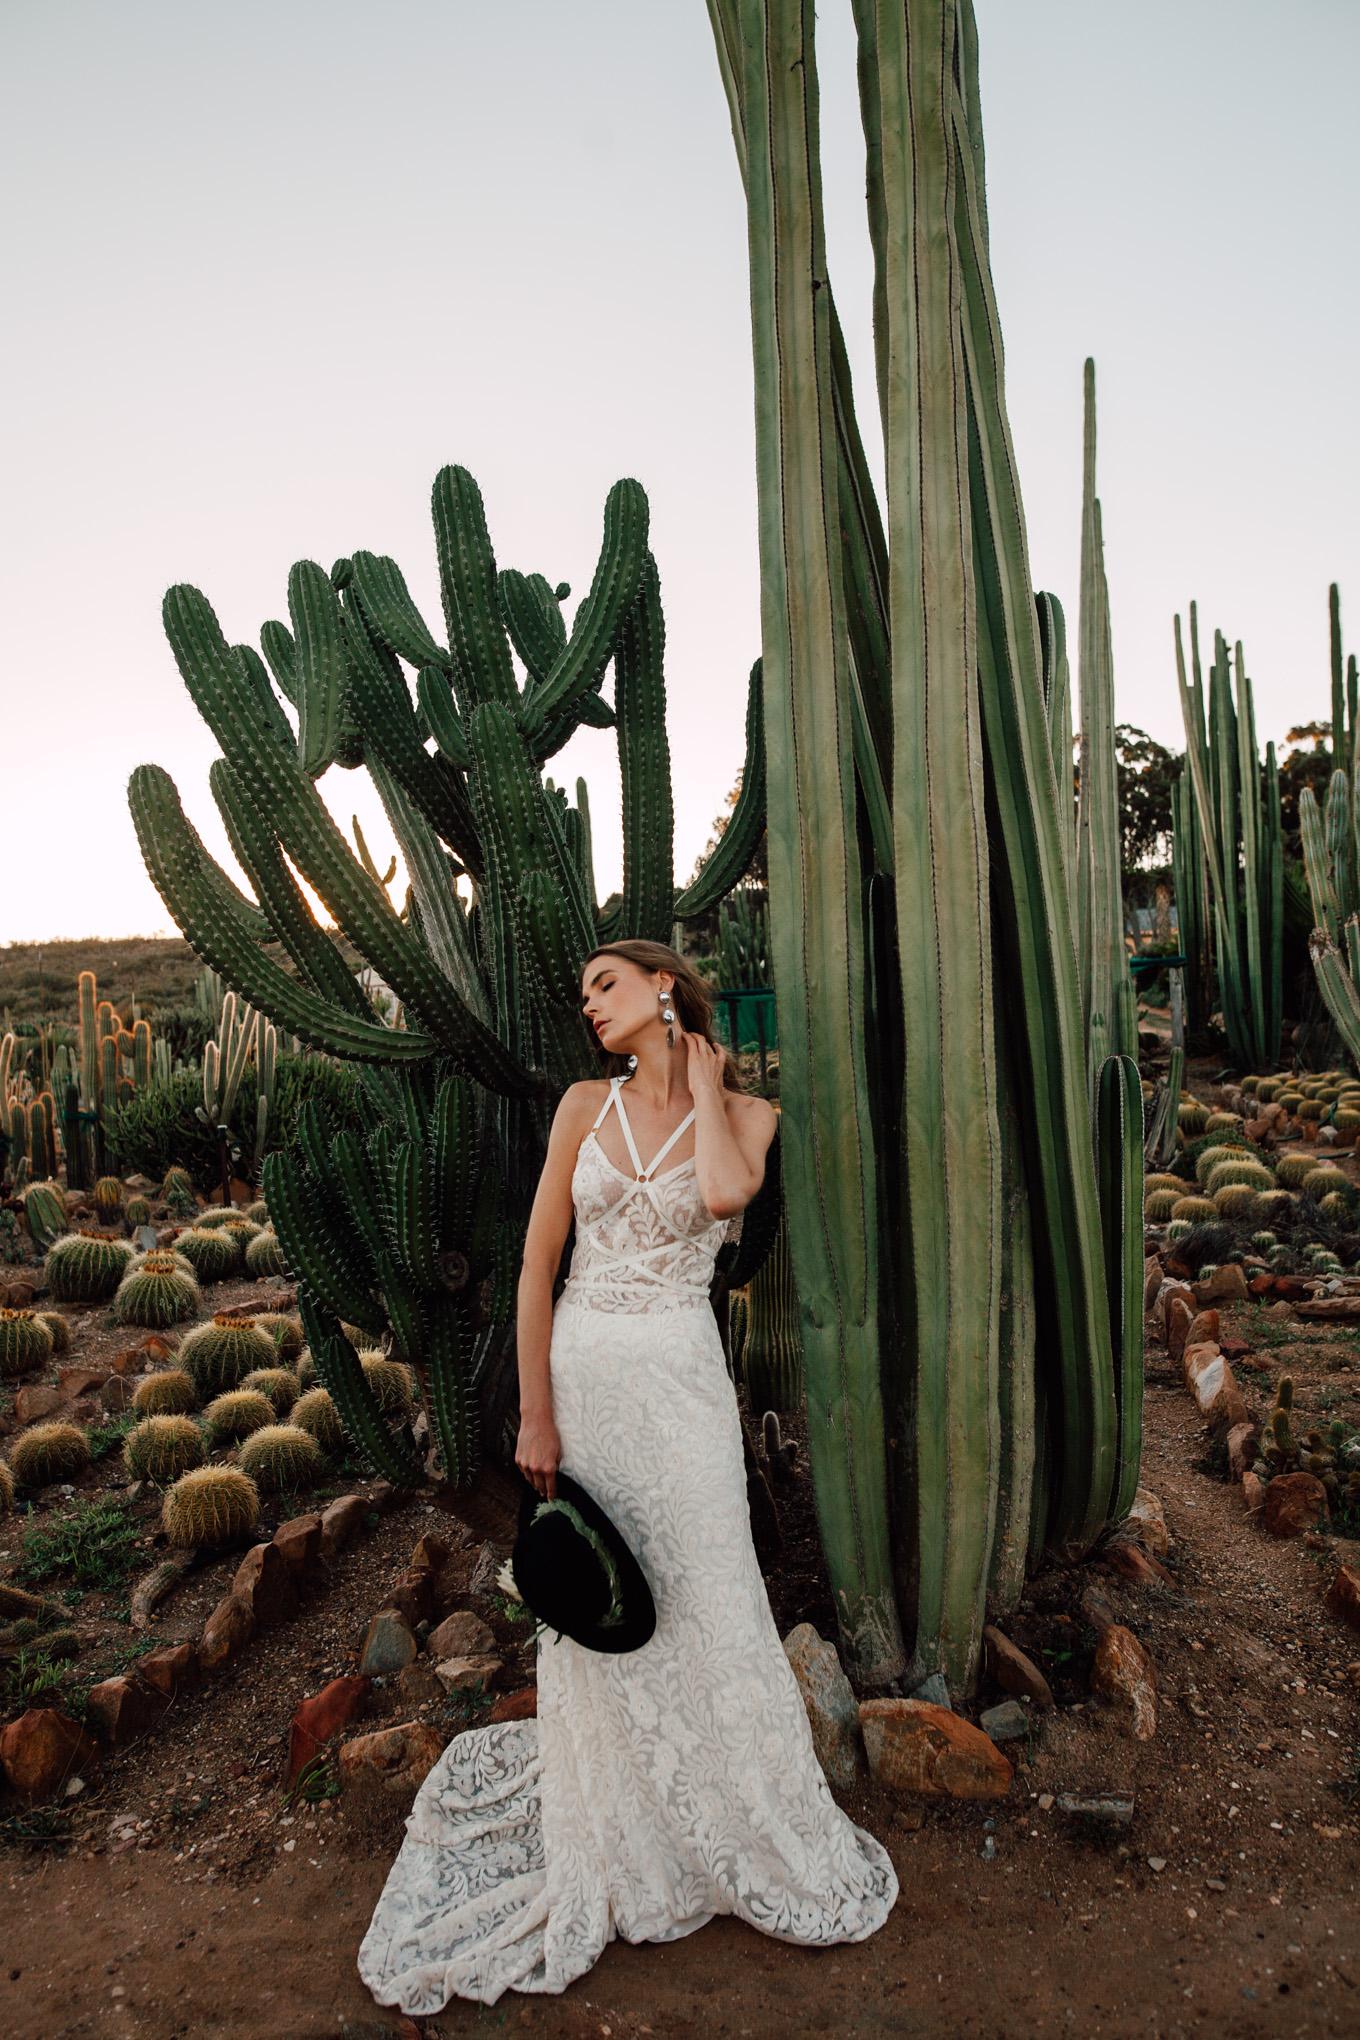 Cape-Town-Pia-Anna-Christian-Wedding-Photography-South-Africa-Bride-Cactus-5.jpg